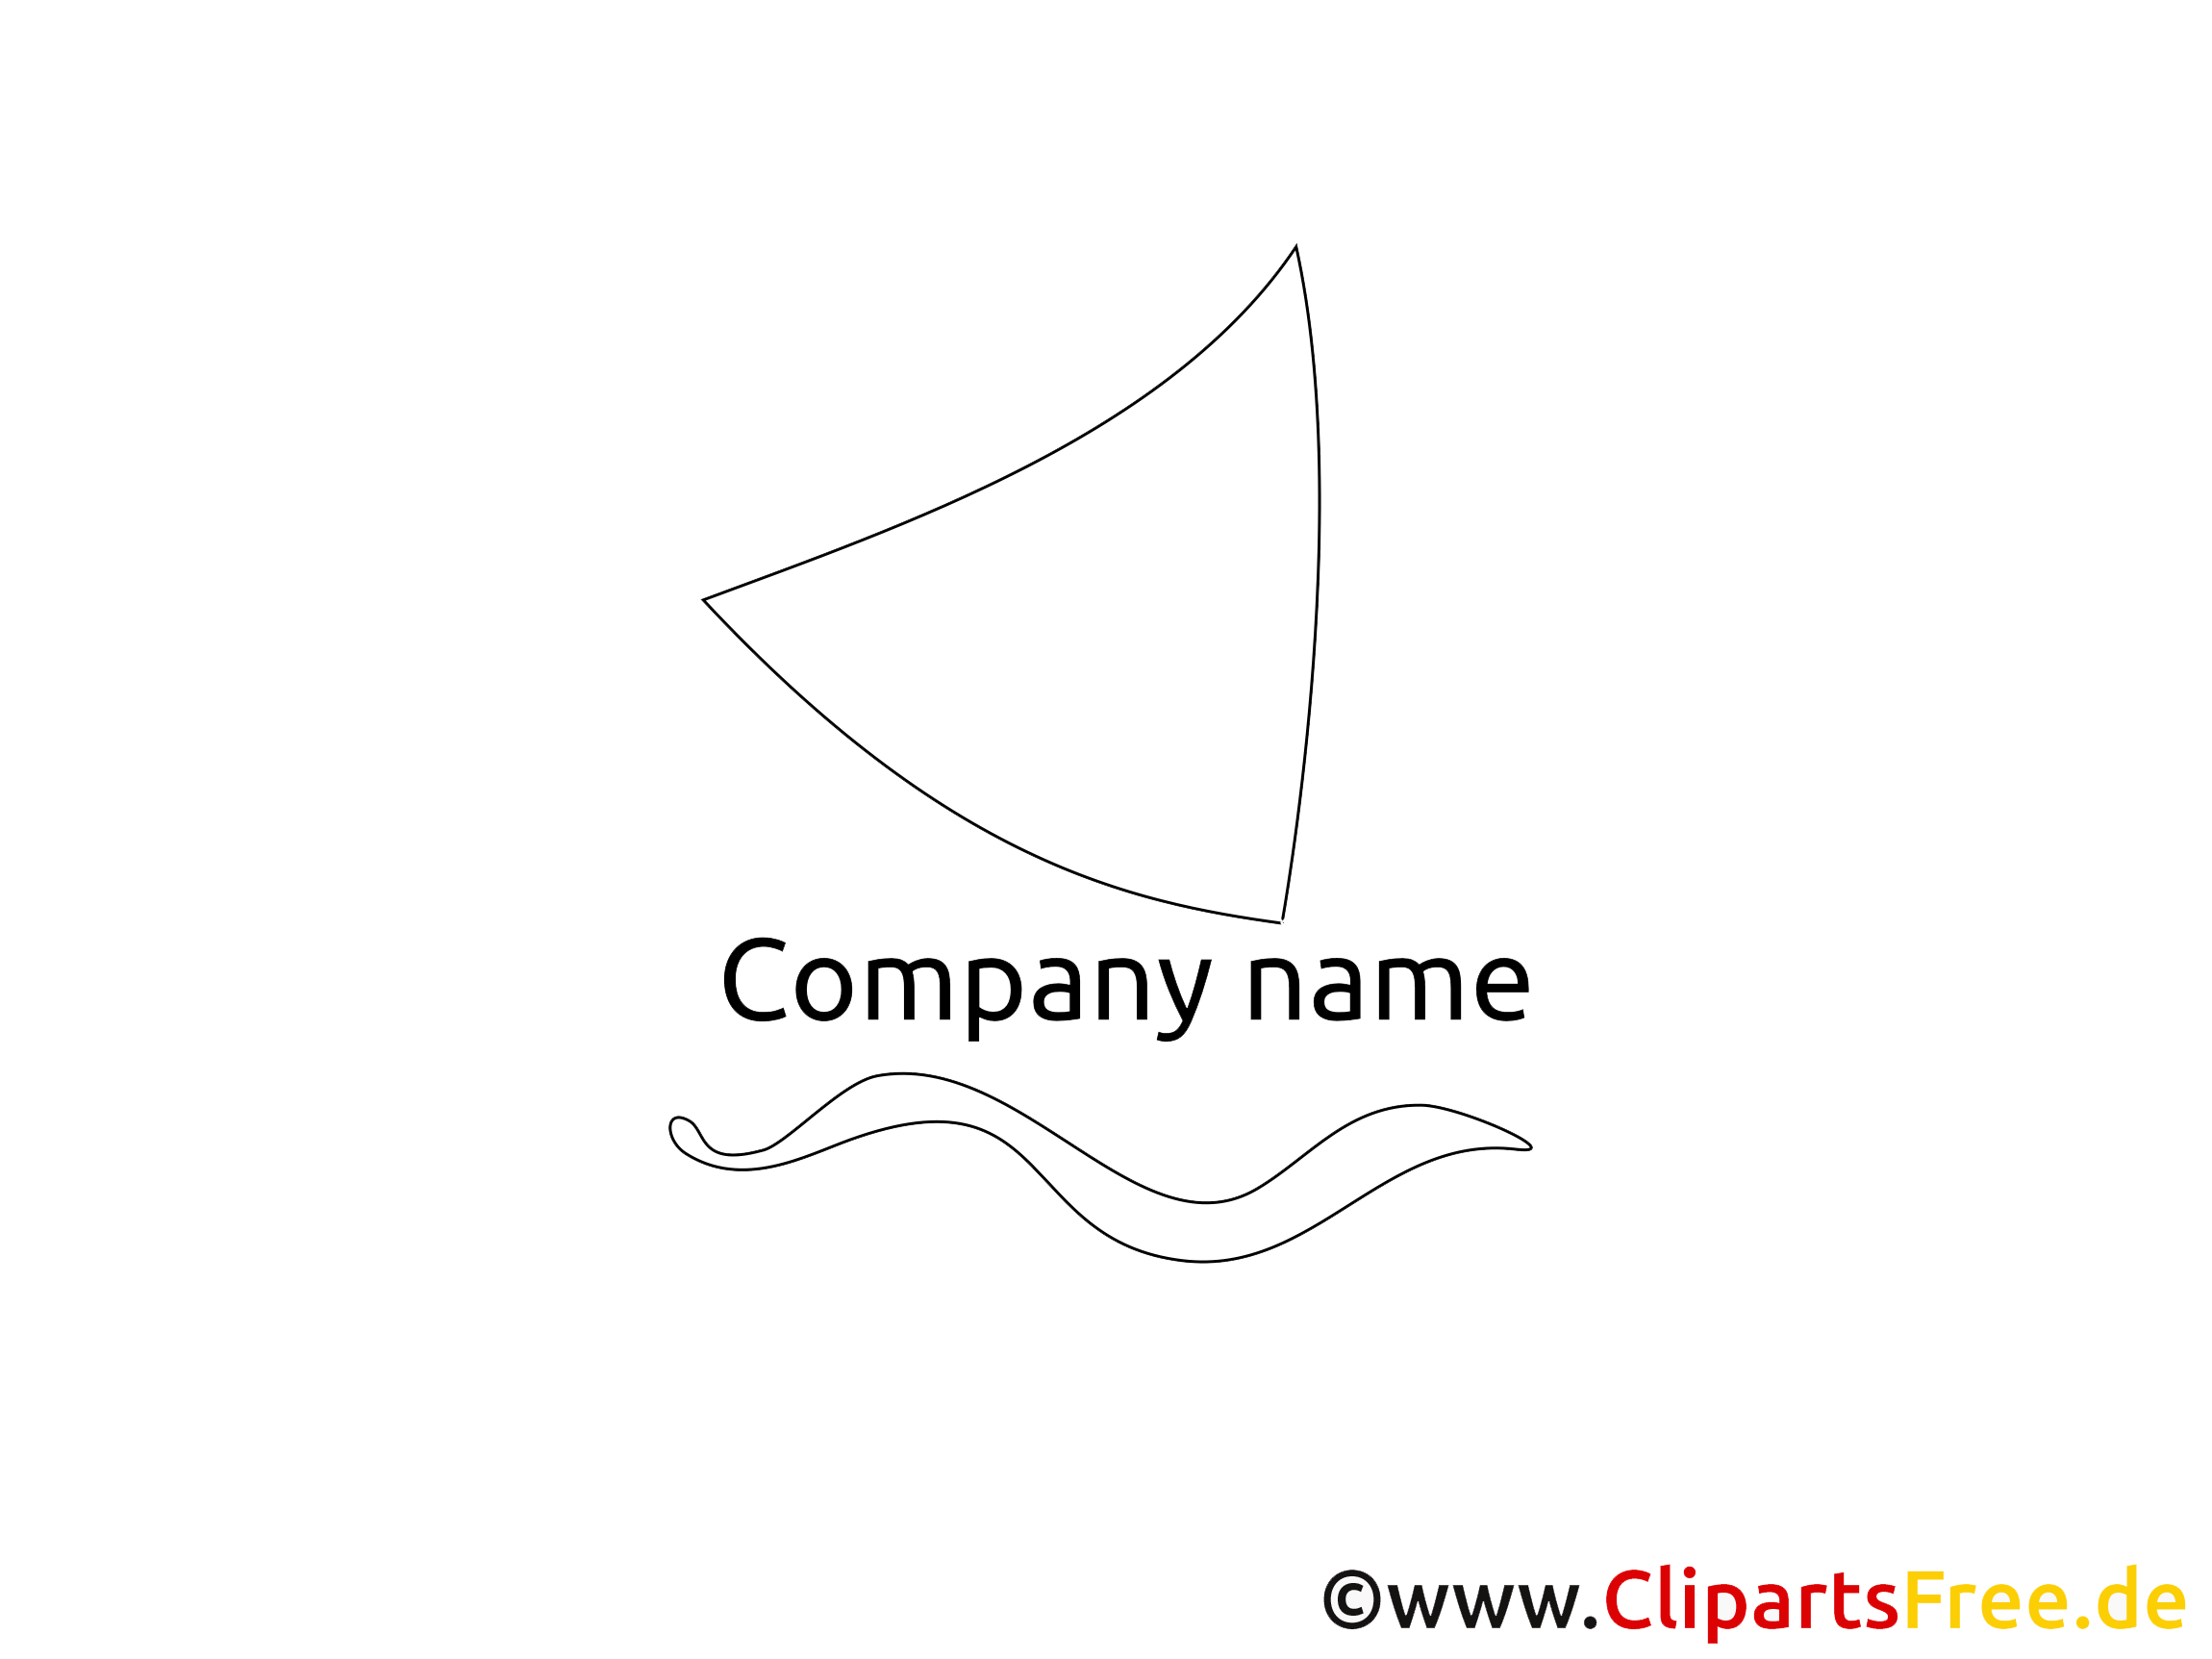 Marque cliparts gratuis – Logo images